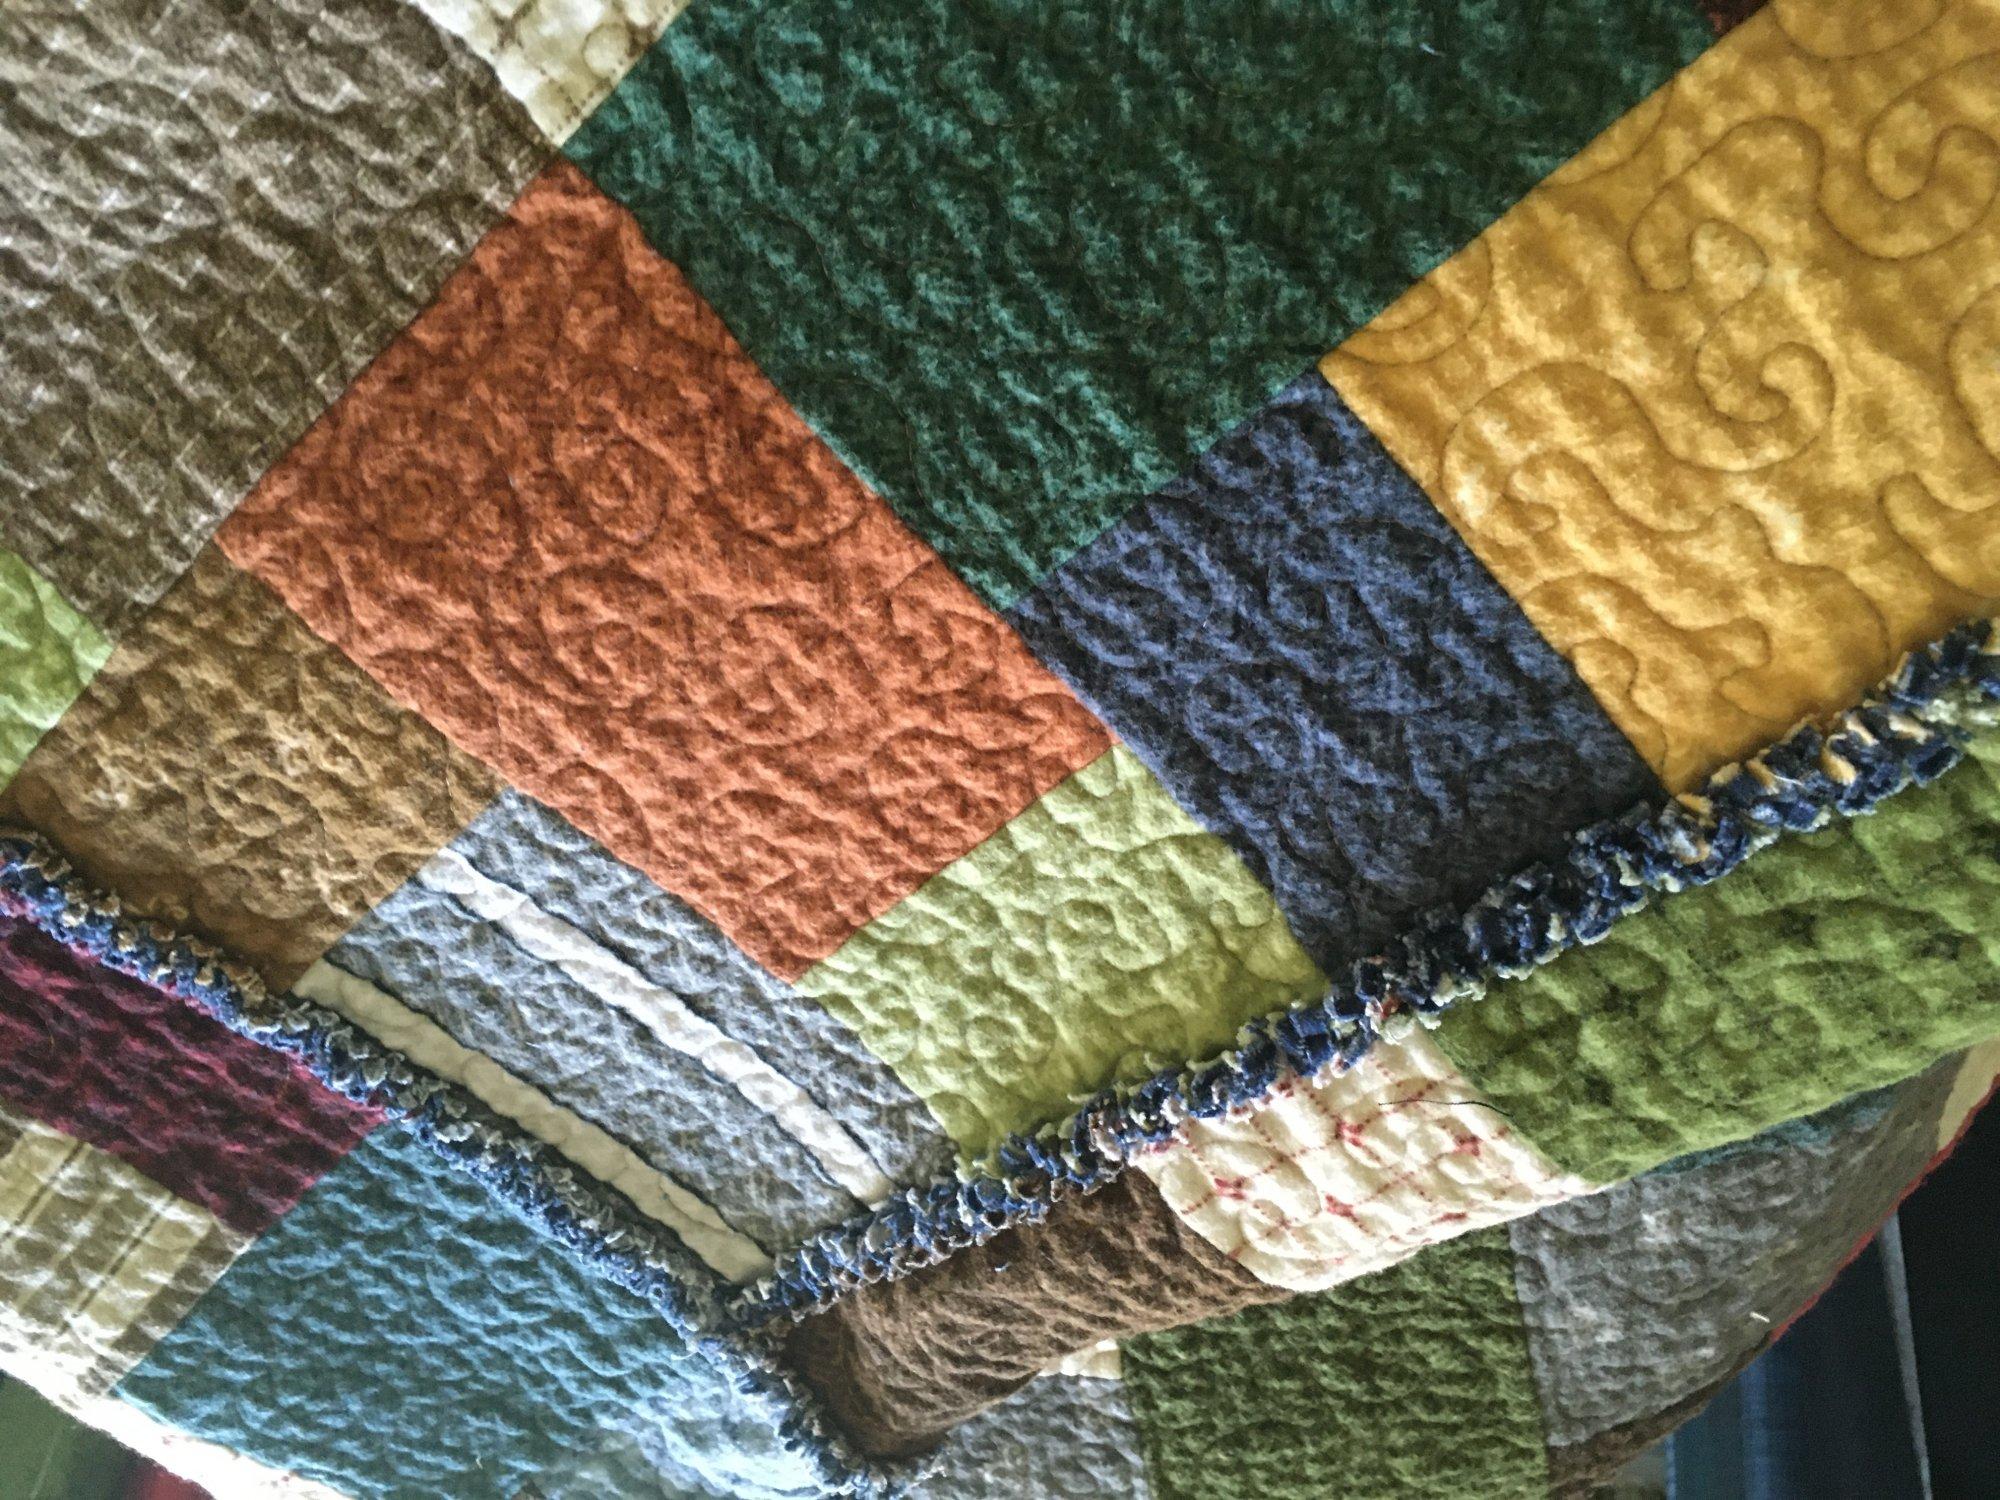 Kit - PaPa Joe Flannel Quilt - Ready to Sew